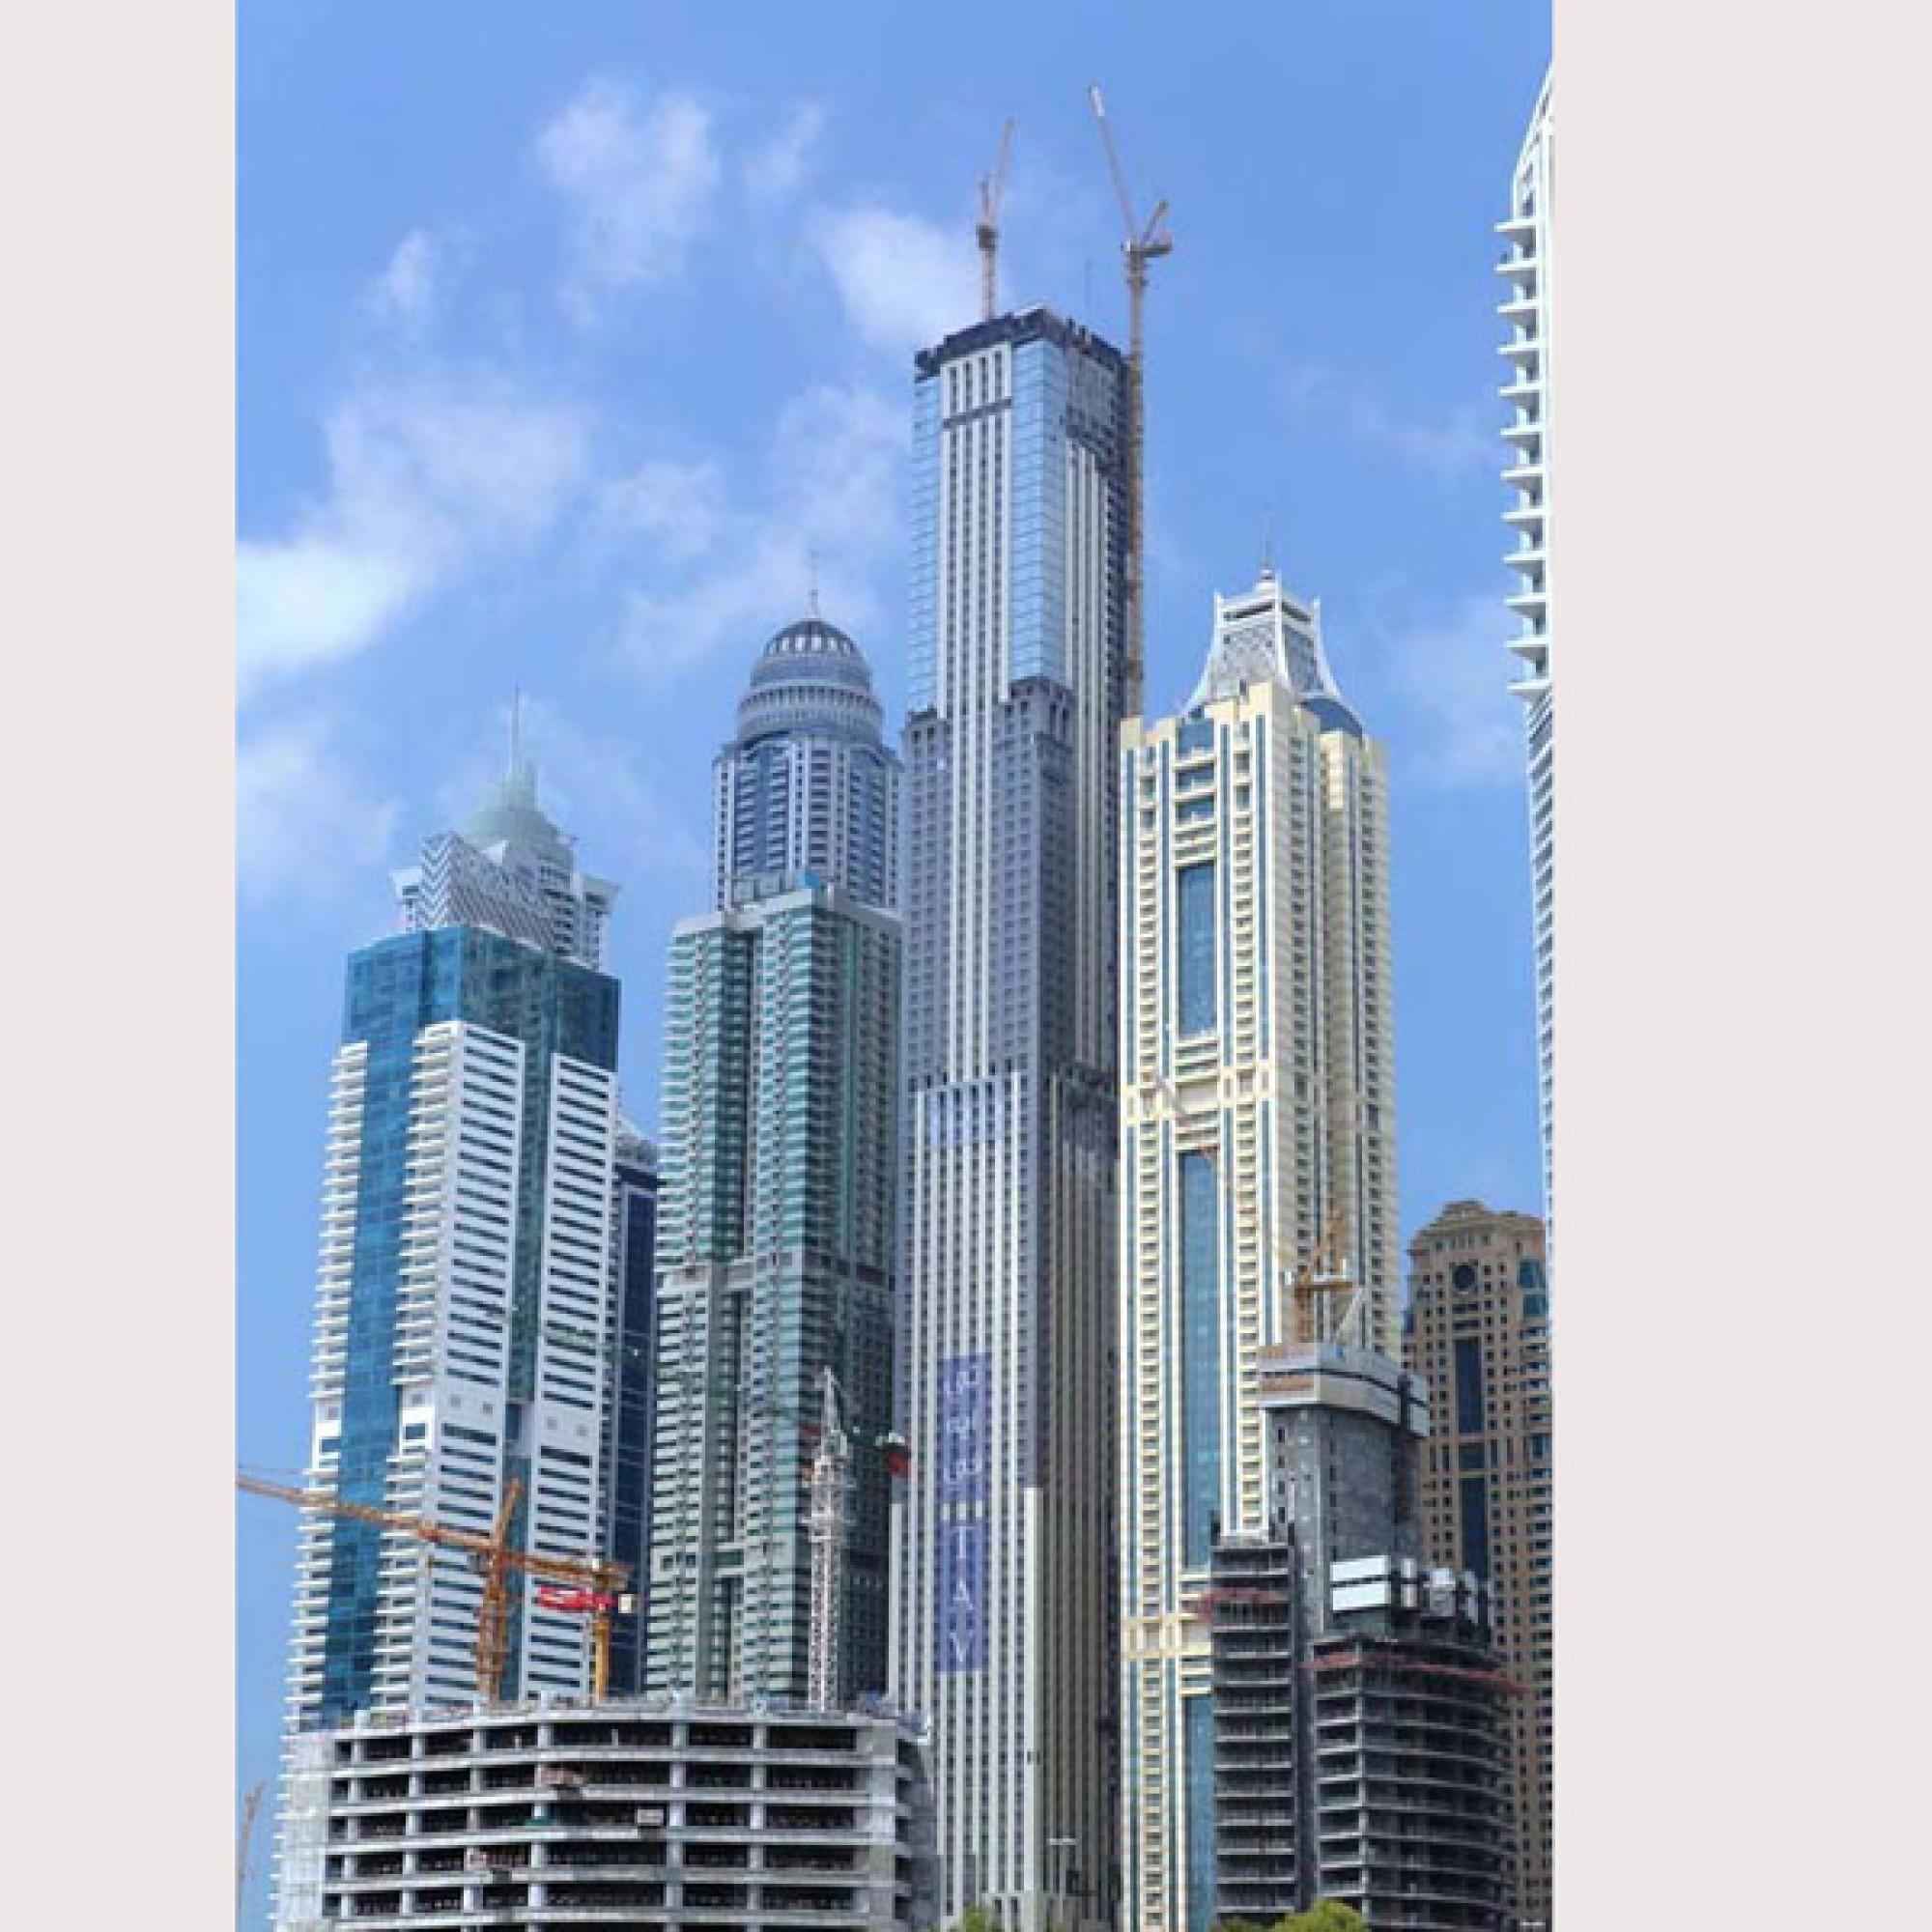 Marina 101, Dubai, Vereinigte Arabische Emirate (TAV Construction)